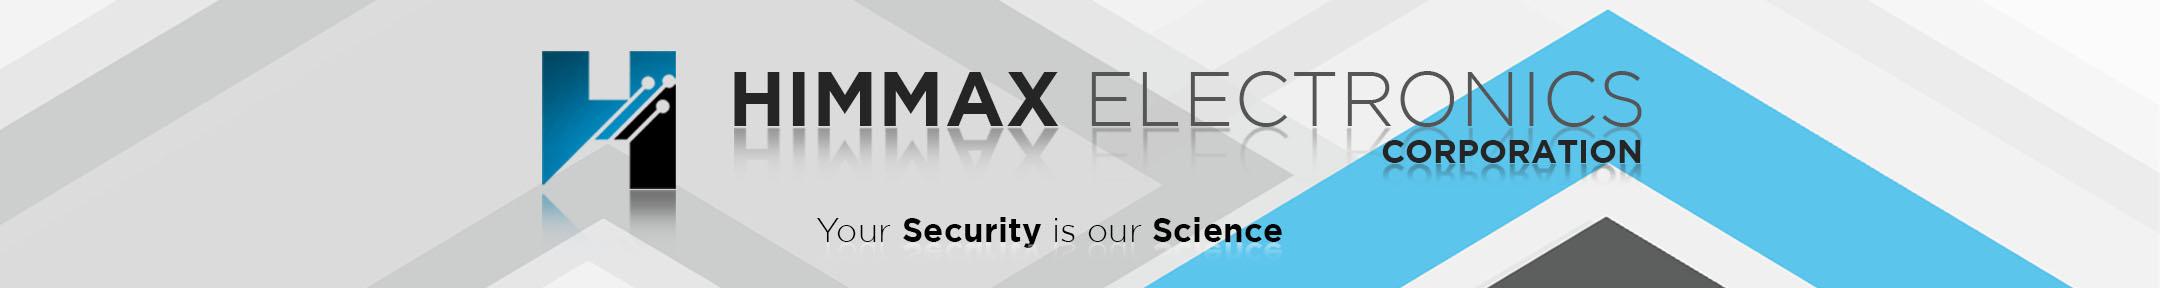 Himmax Electronics Corporation Logo